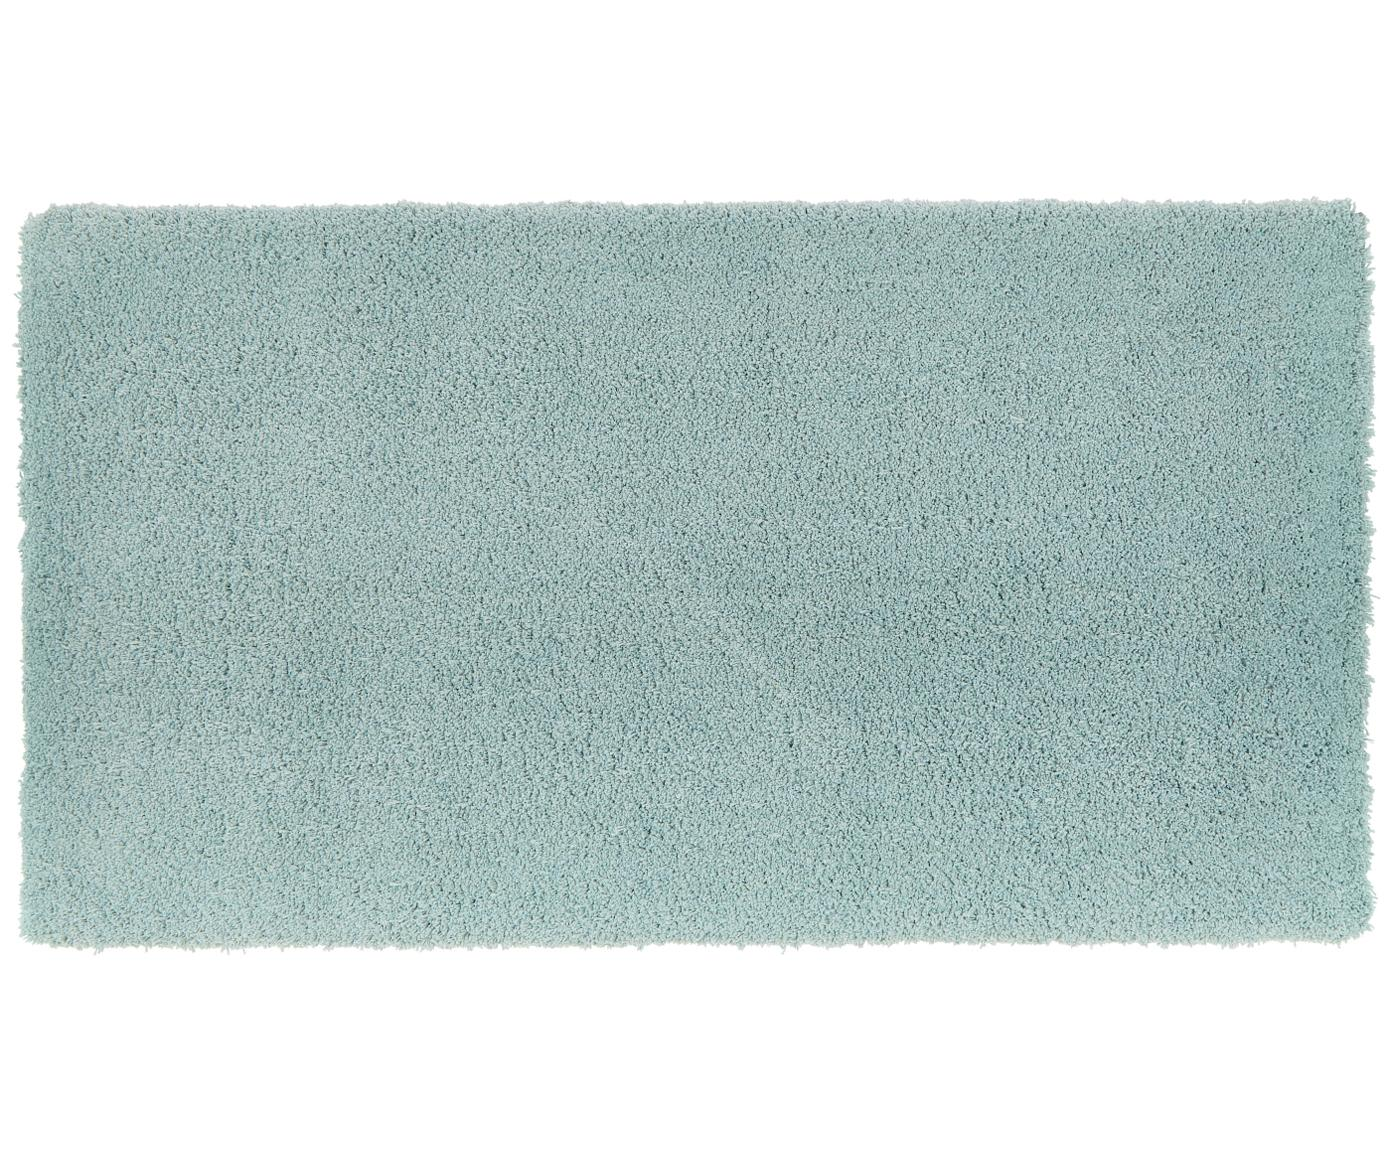 Flauschiger Hochflor-Teppich Leighton in Mintgrün, Flor: 100% Polyester (Mikrofase, Mintgrün, B 80 x L 150 cm (Größe XS)